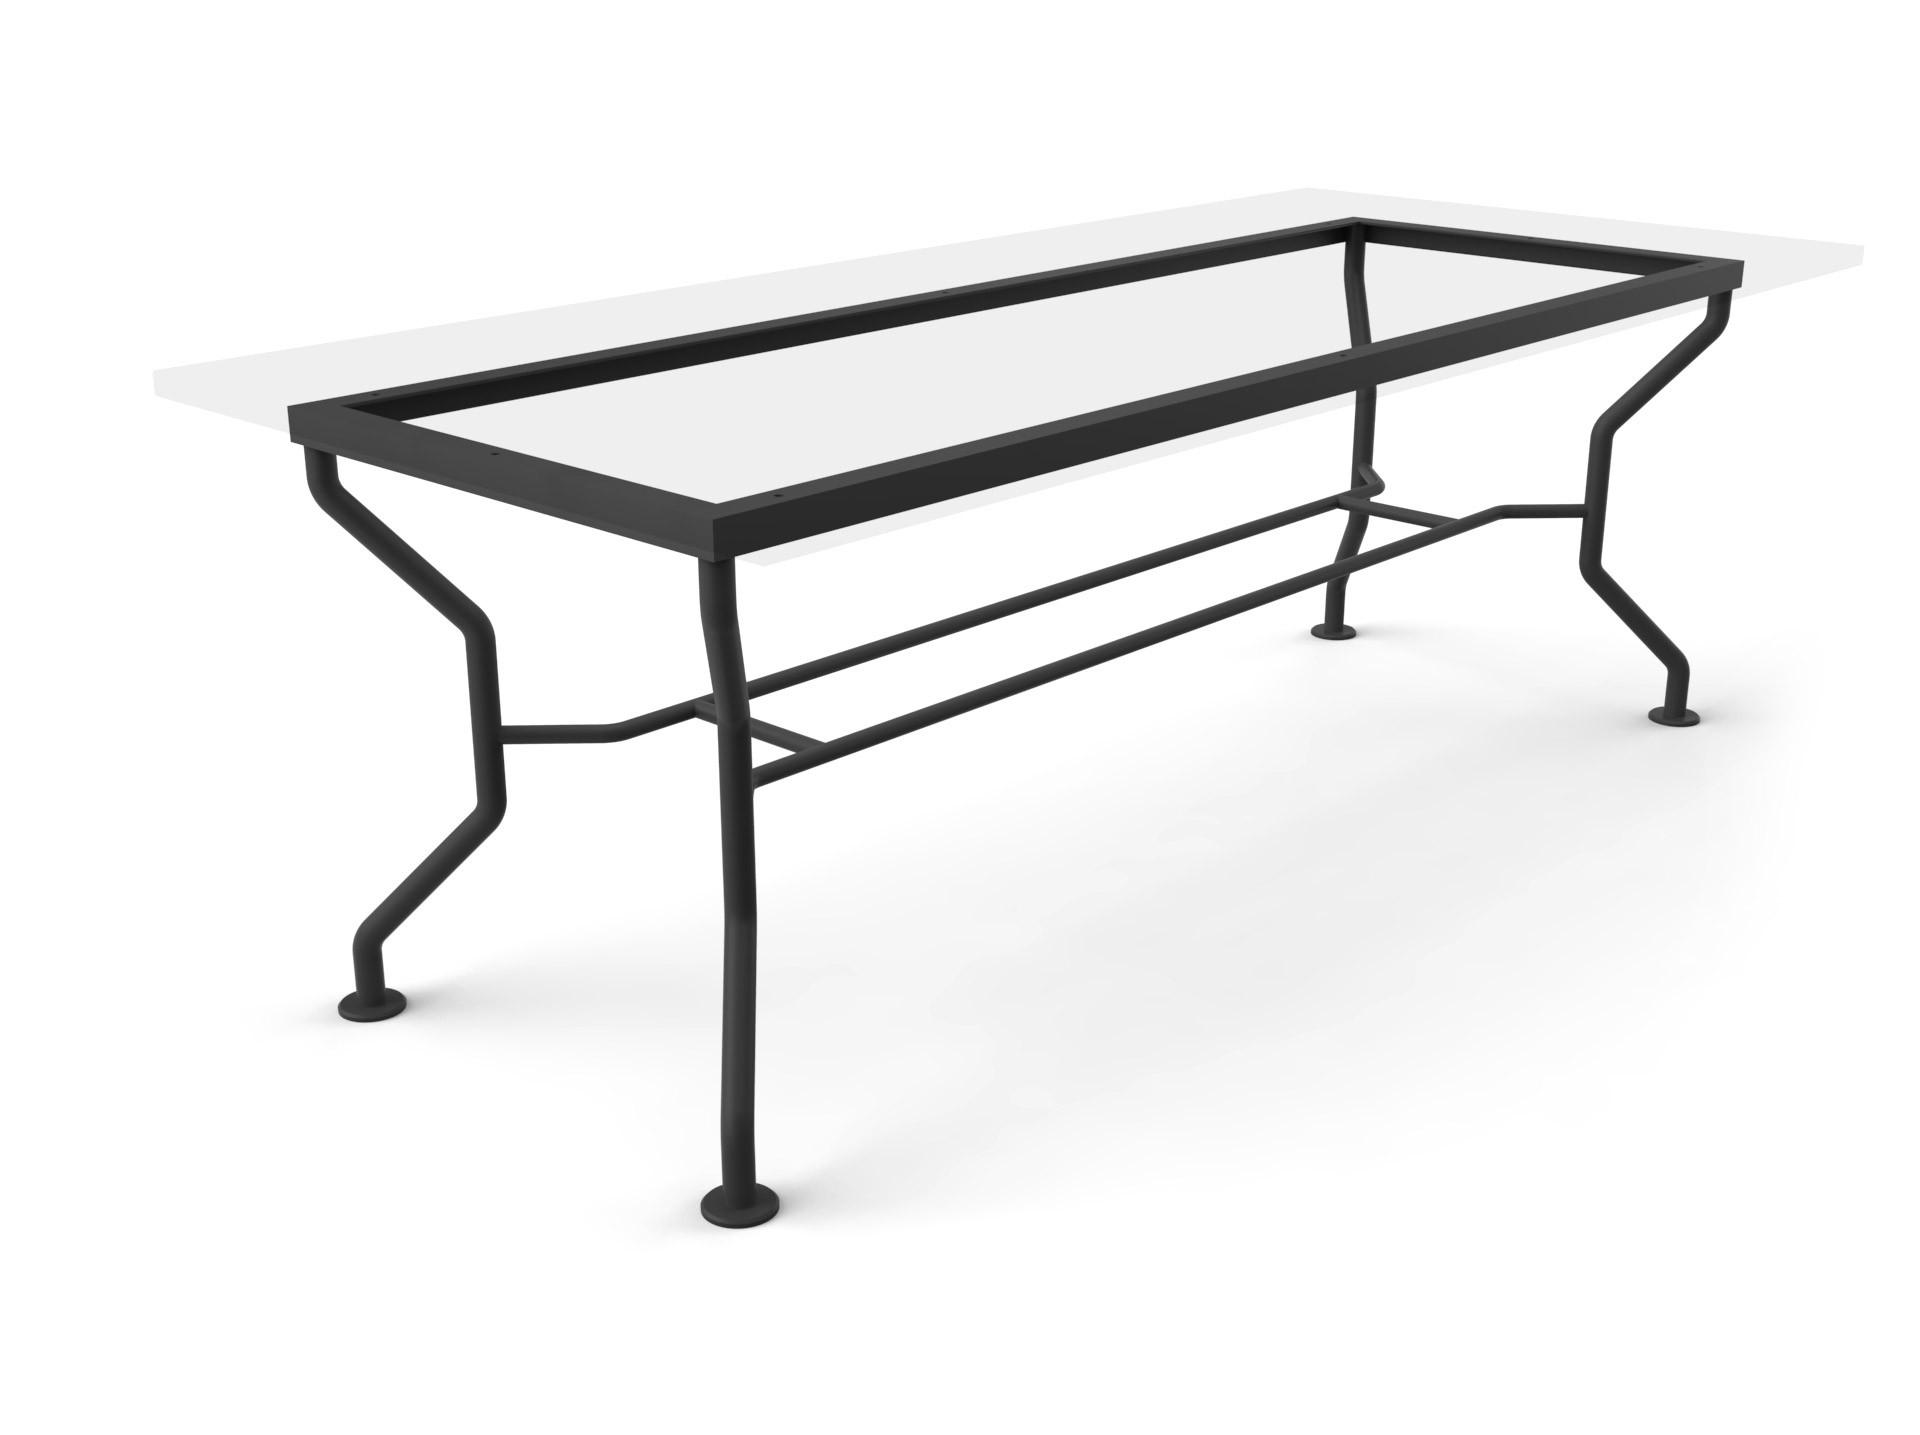 Tischgestell Universal